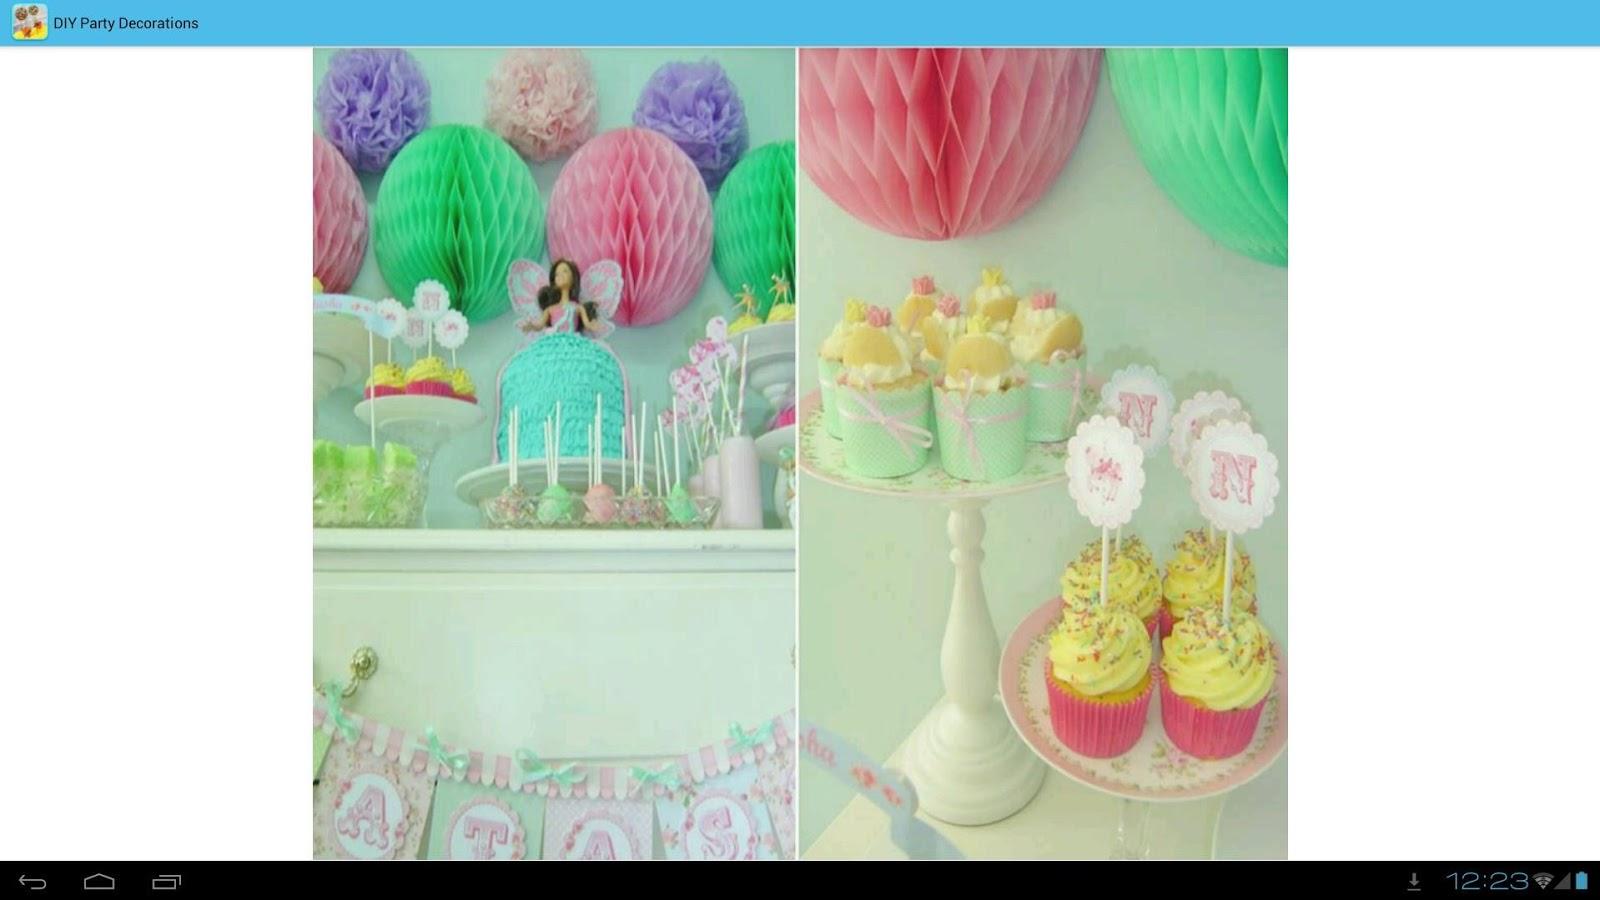 diy party decorations ideas screenshot